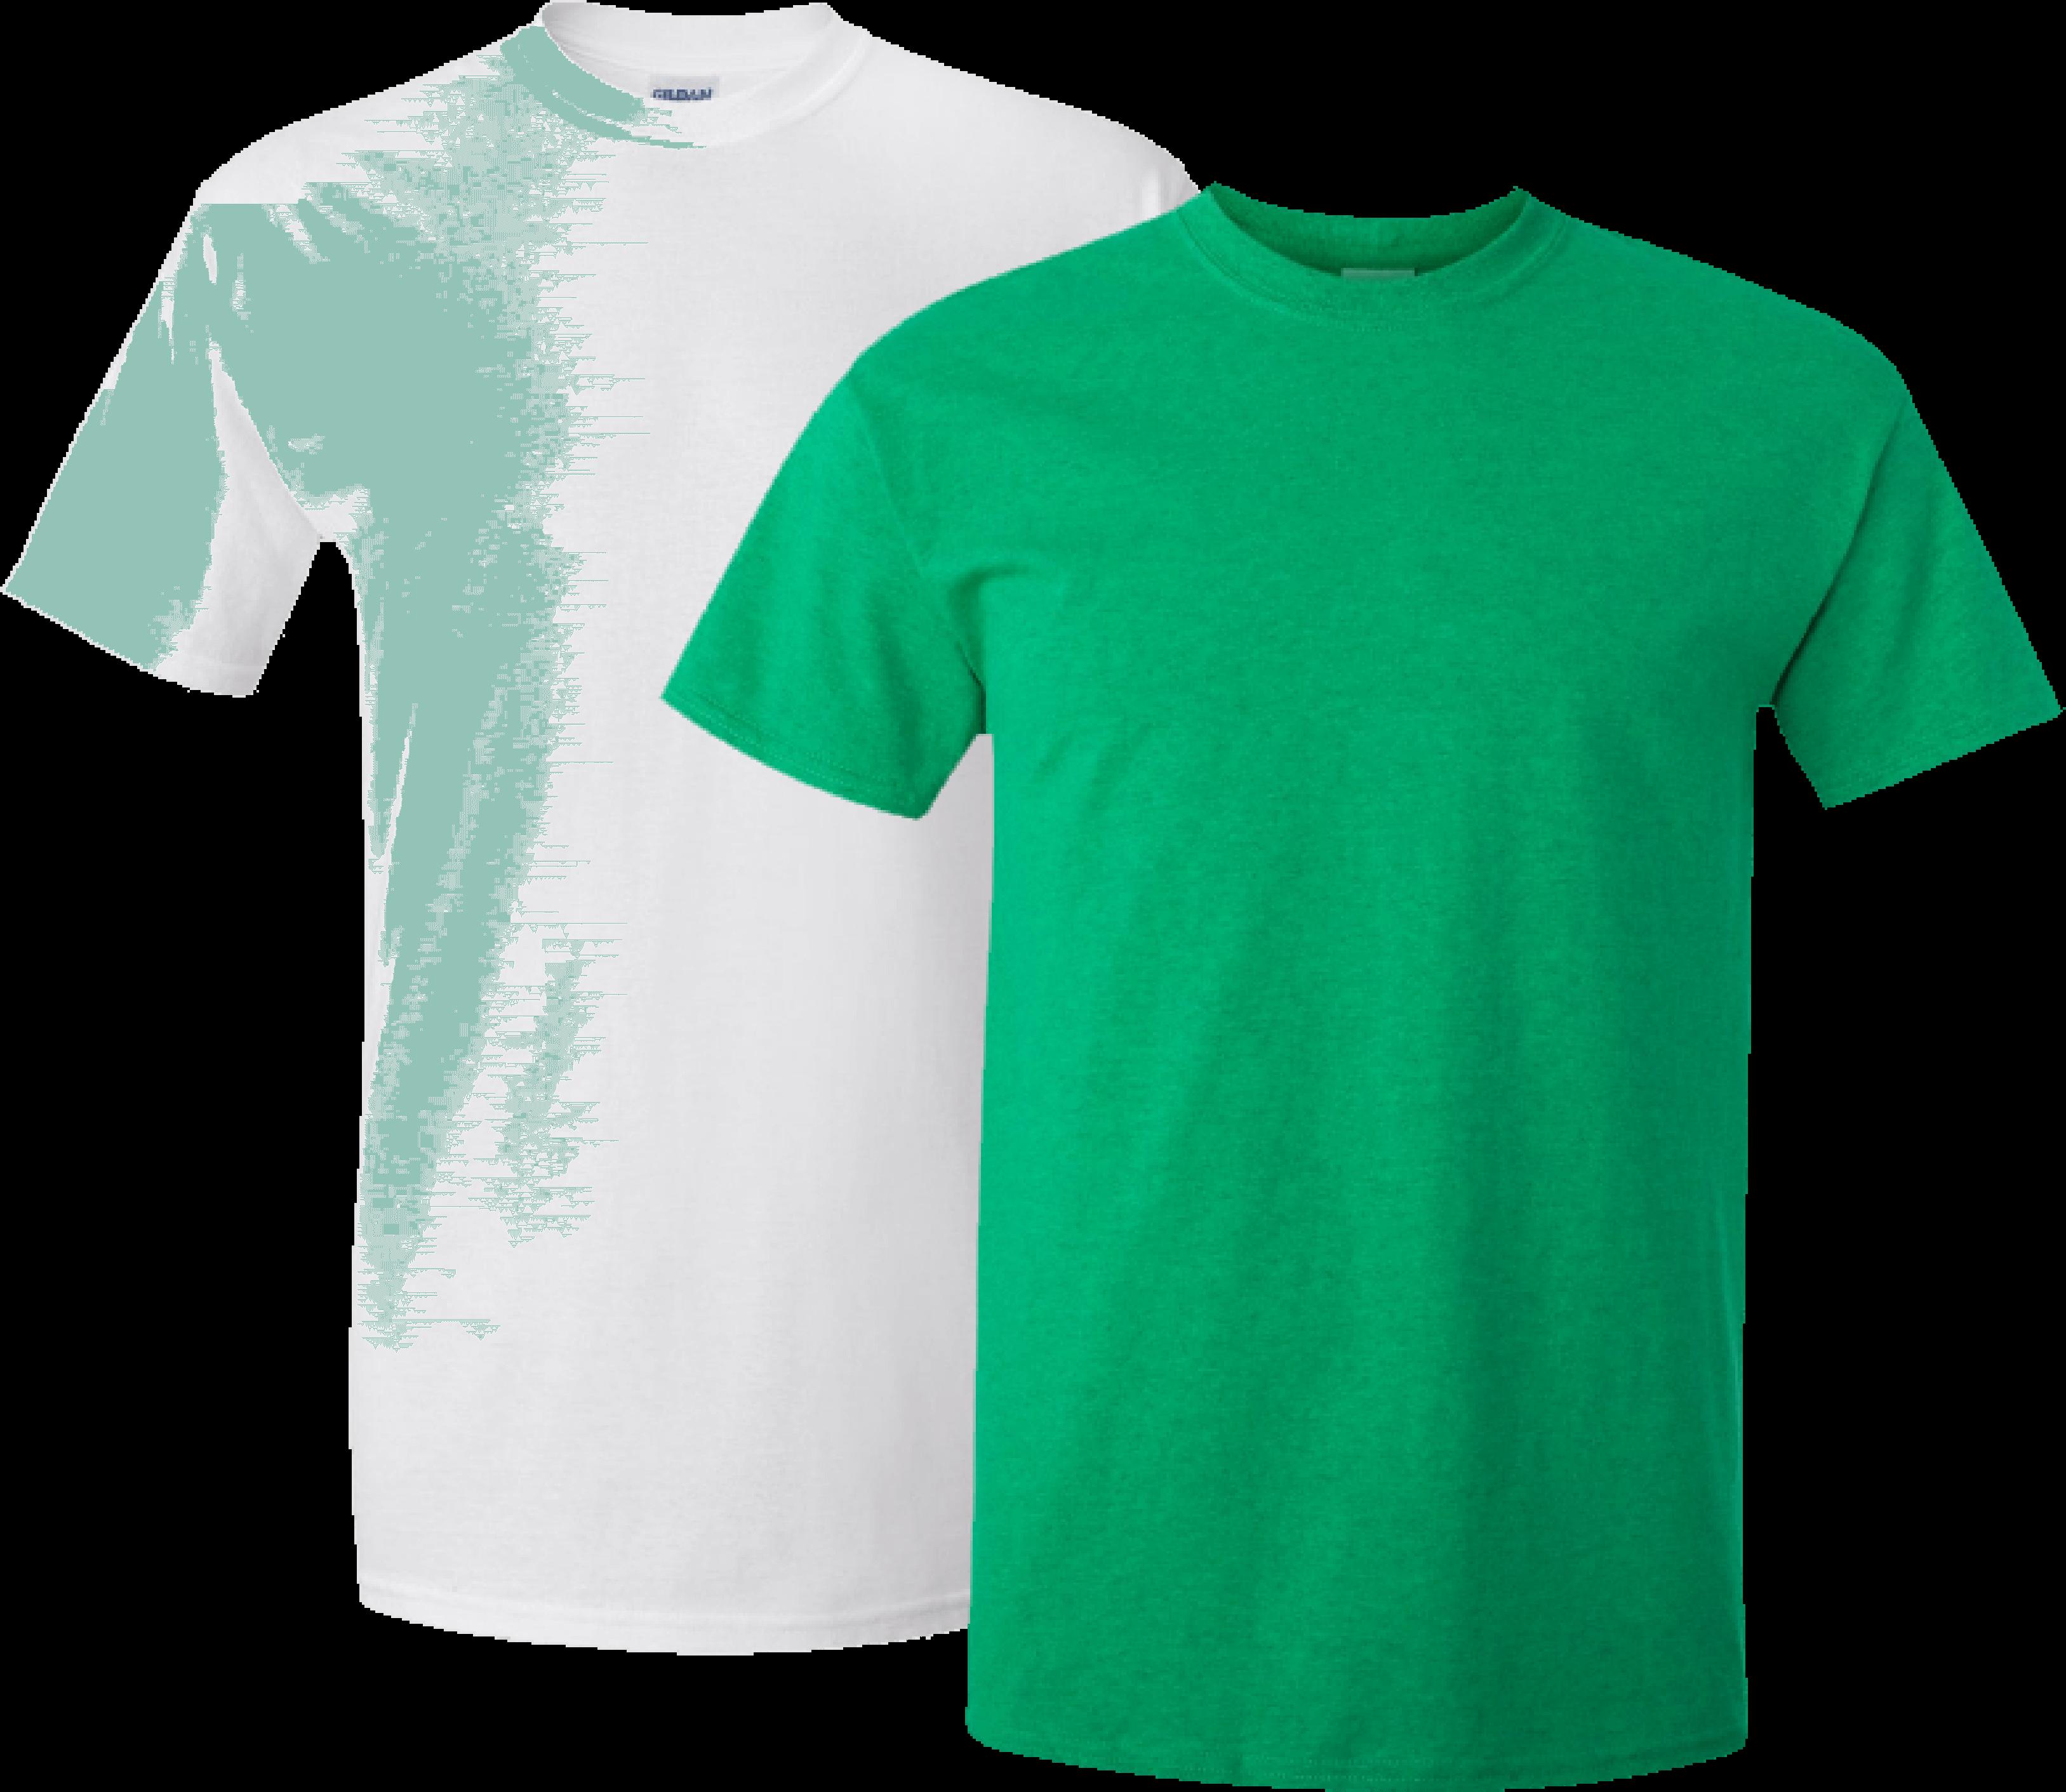 Custom t shirts in. Hoodie clipart crewneck sweatshirt